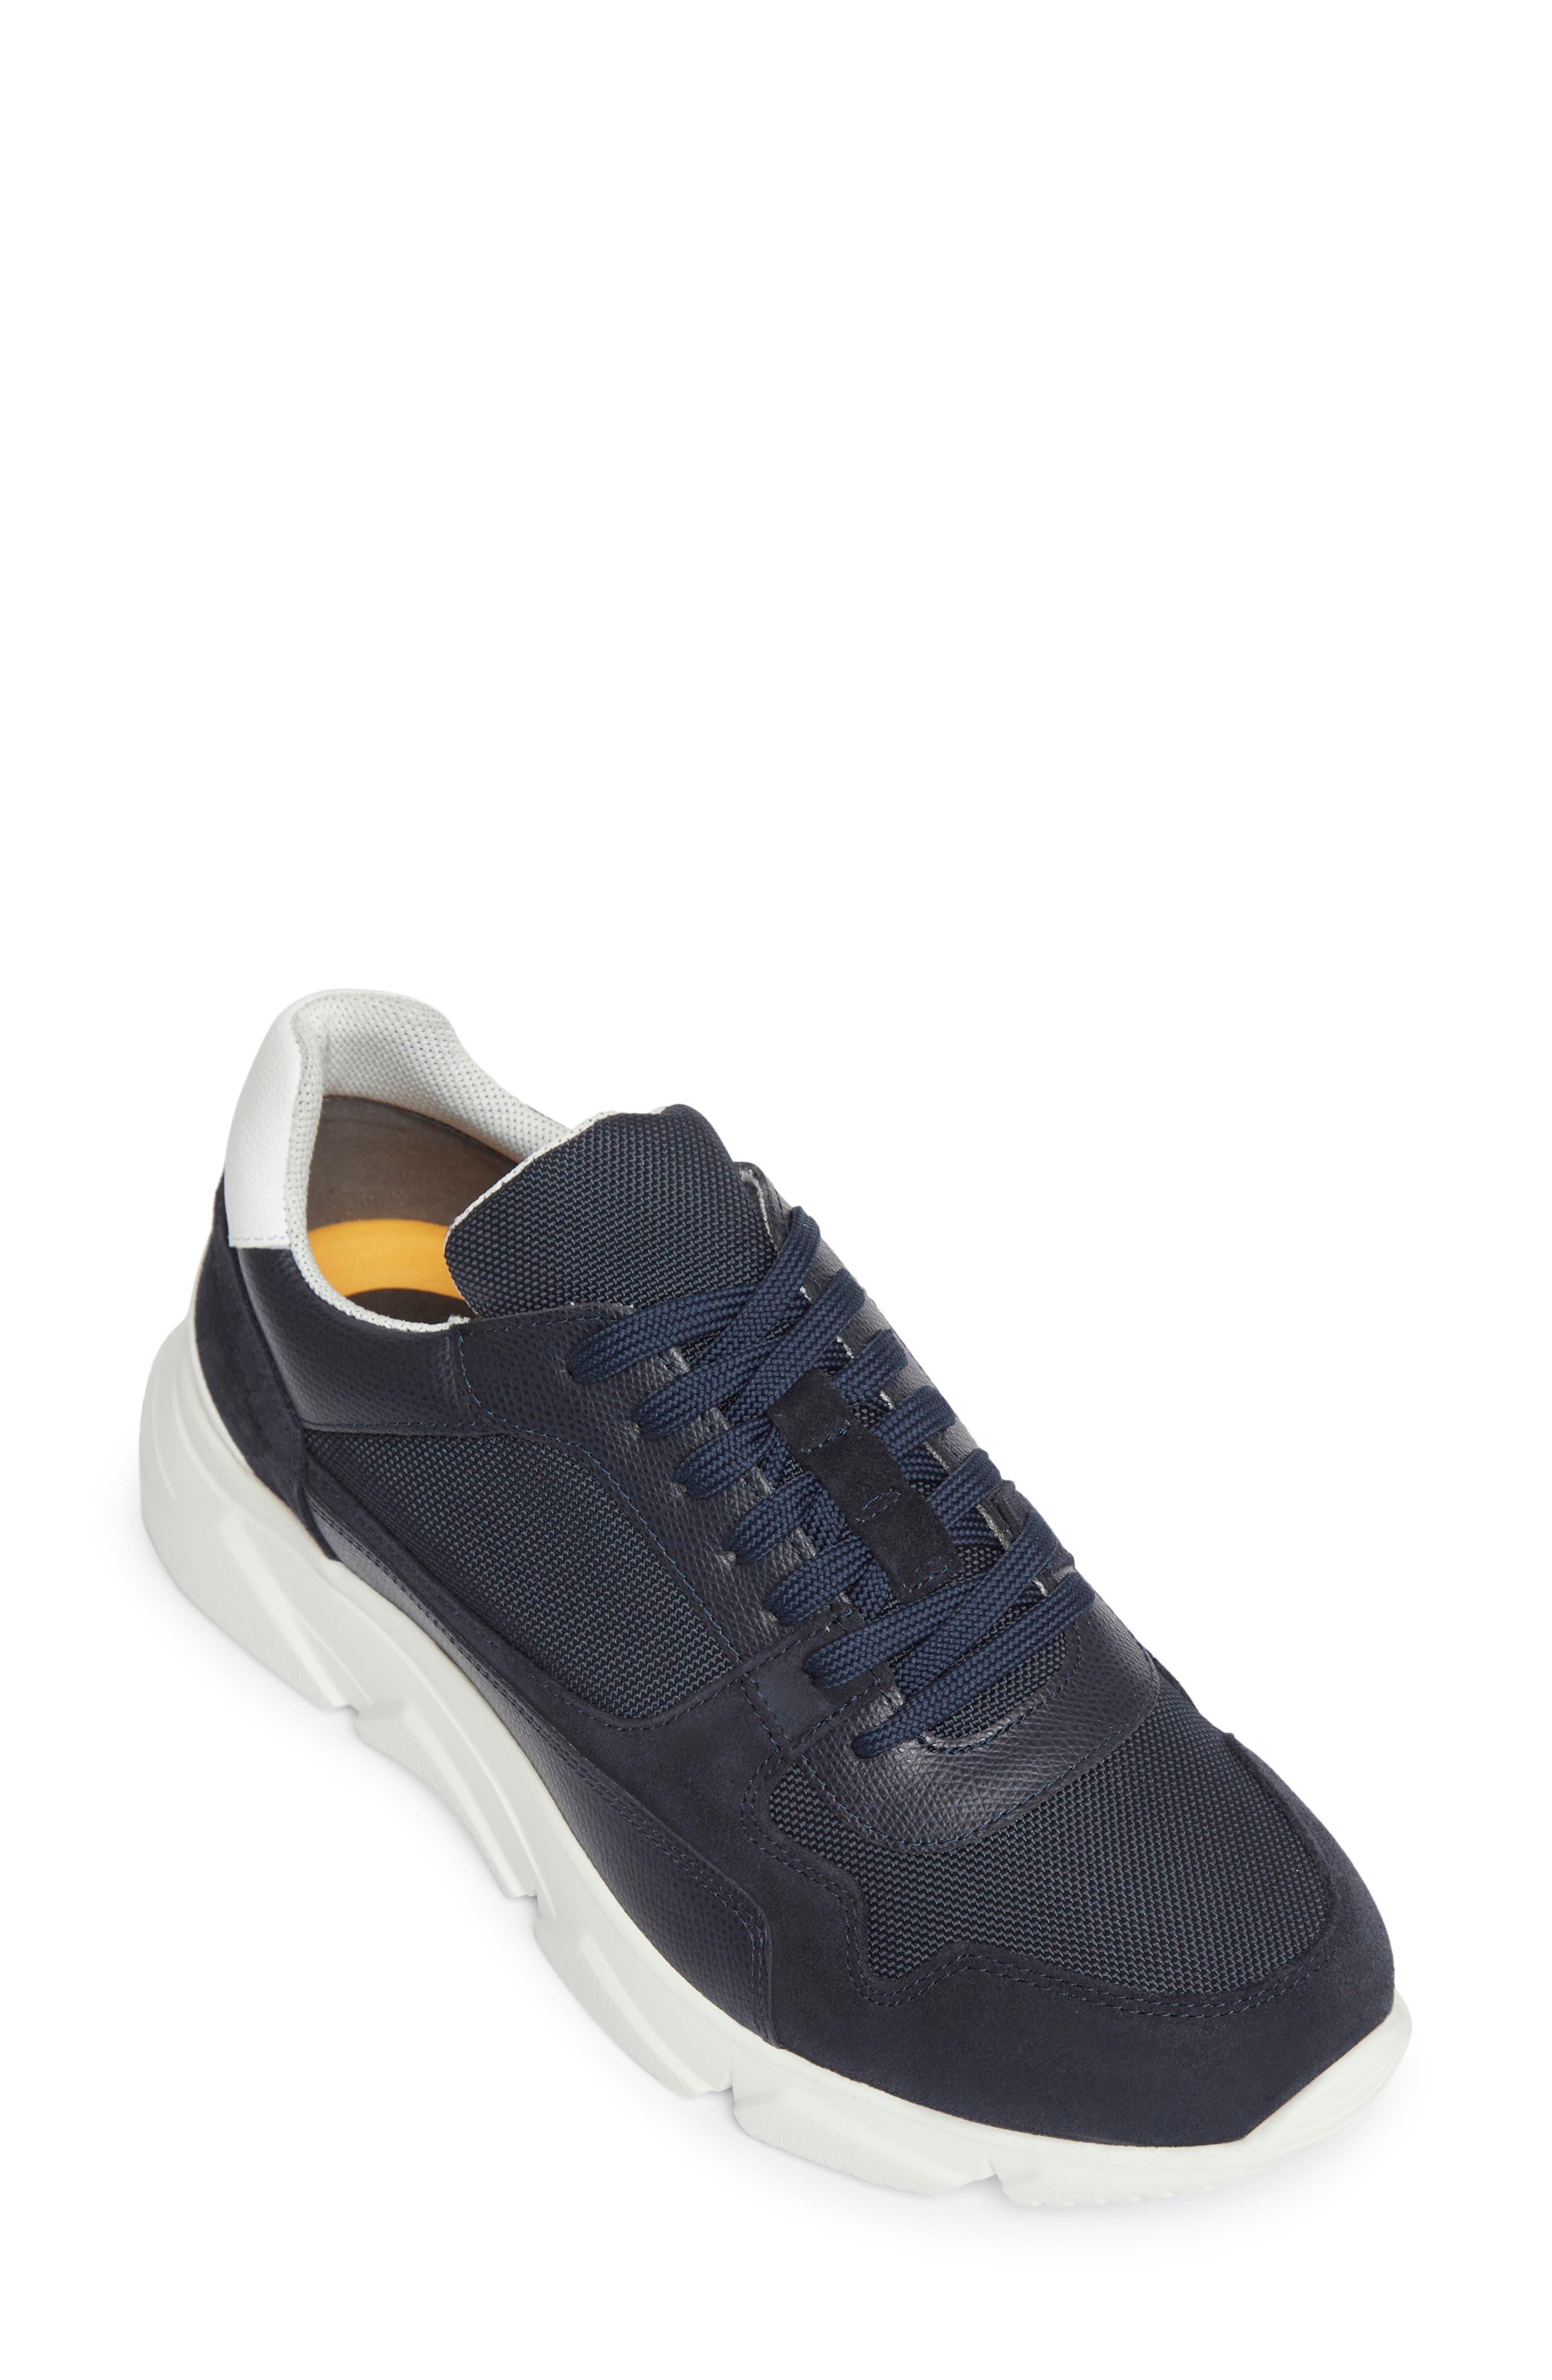 Varden Mid Jogger Sneaker